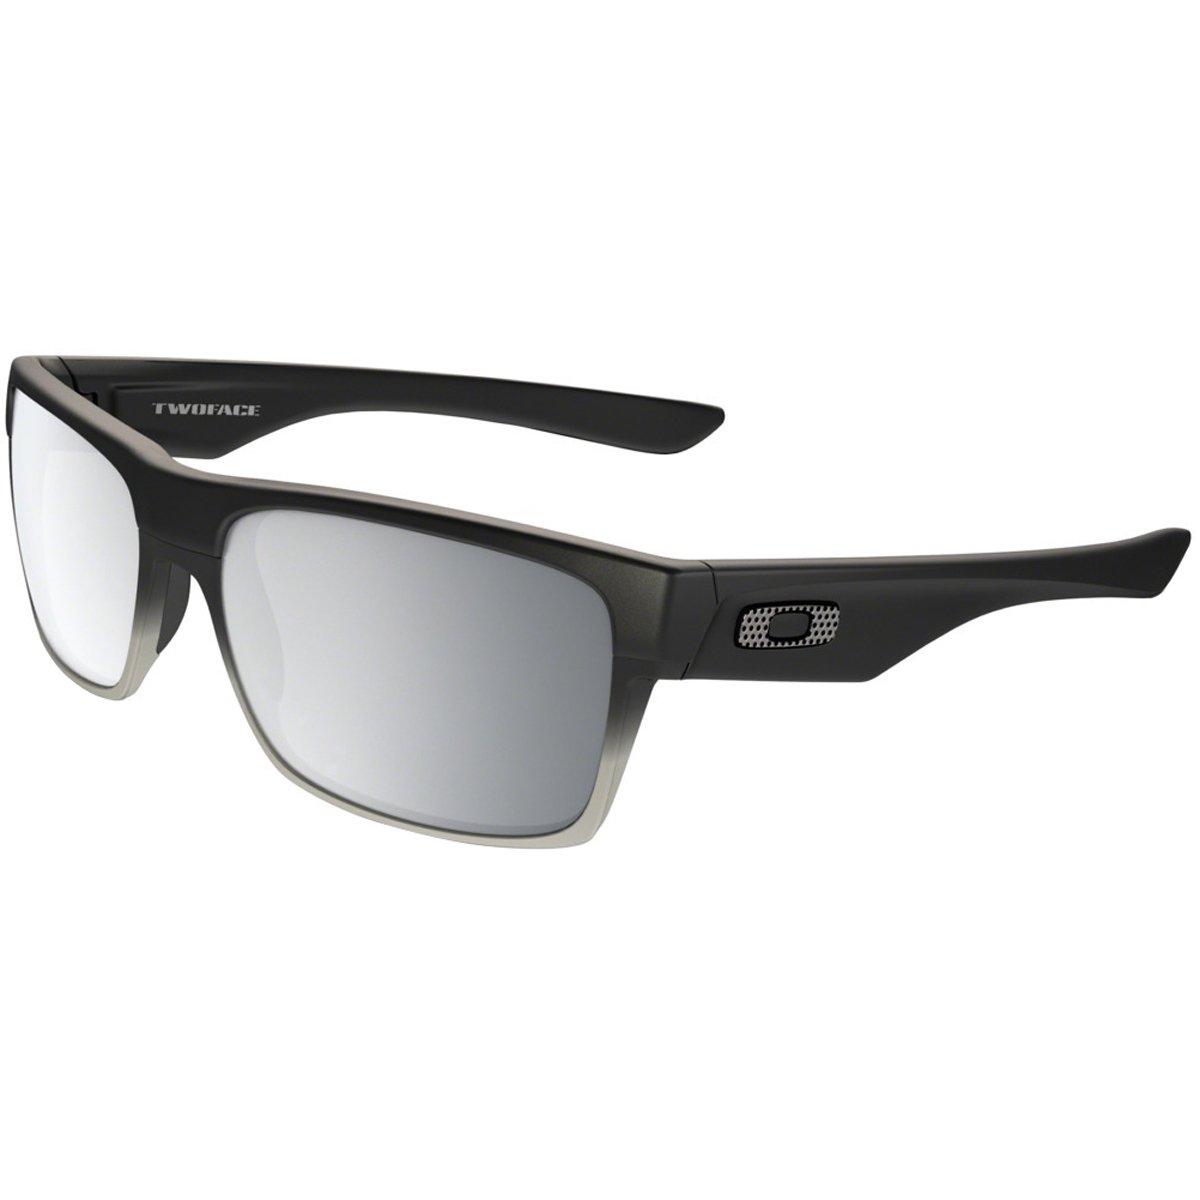 Oakley Men's Twoface Non-Polarized Iridium Square Sunglasses, Matte Black w/Chrome Iridium, 60 mm